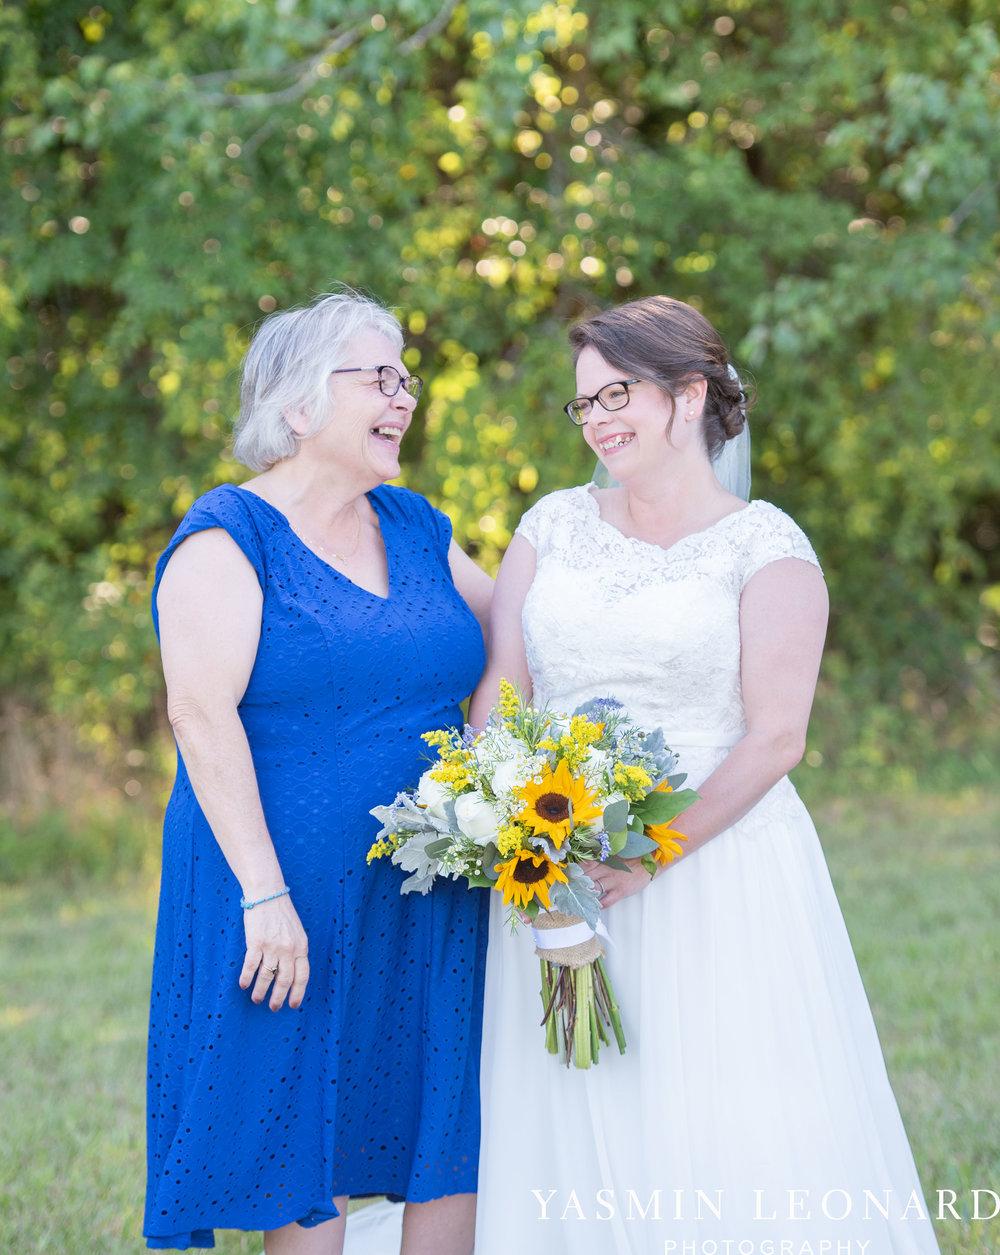 Patty and Matt - Sunflowers and Lemons - NC Wedding Photographer - Yasmin Leonard Photography-17.jpg